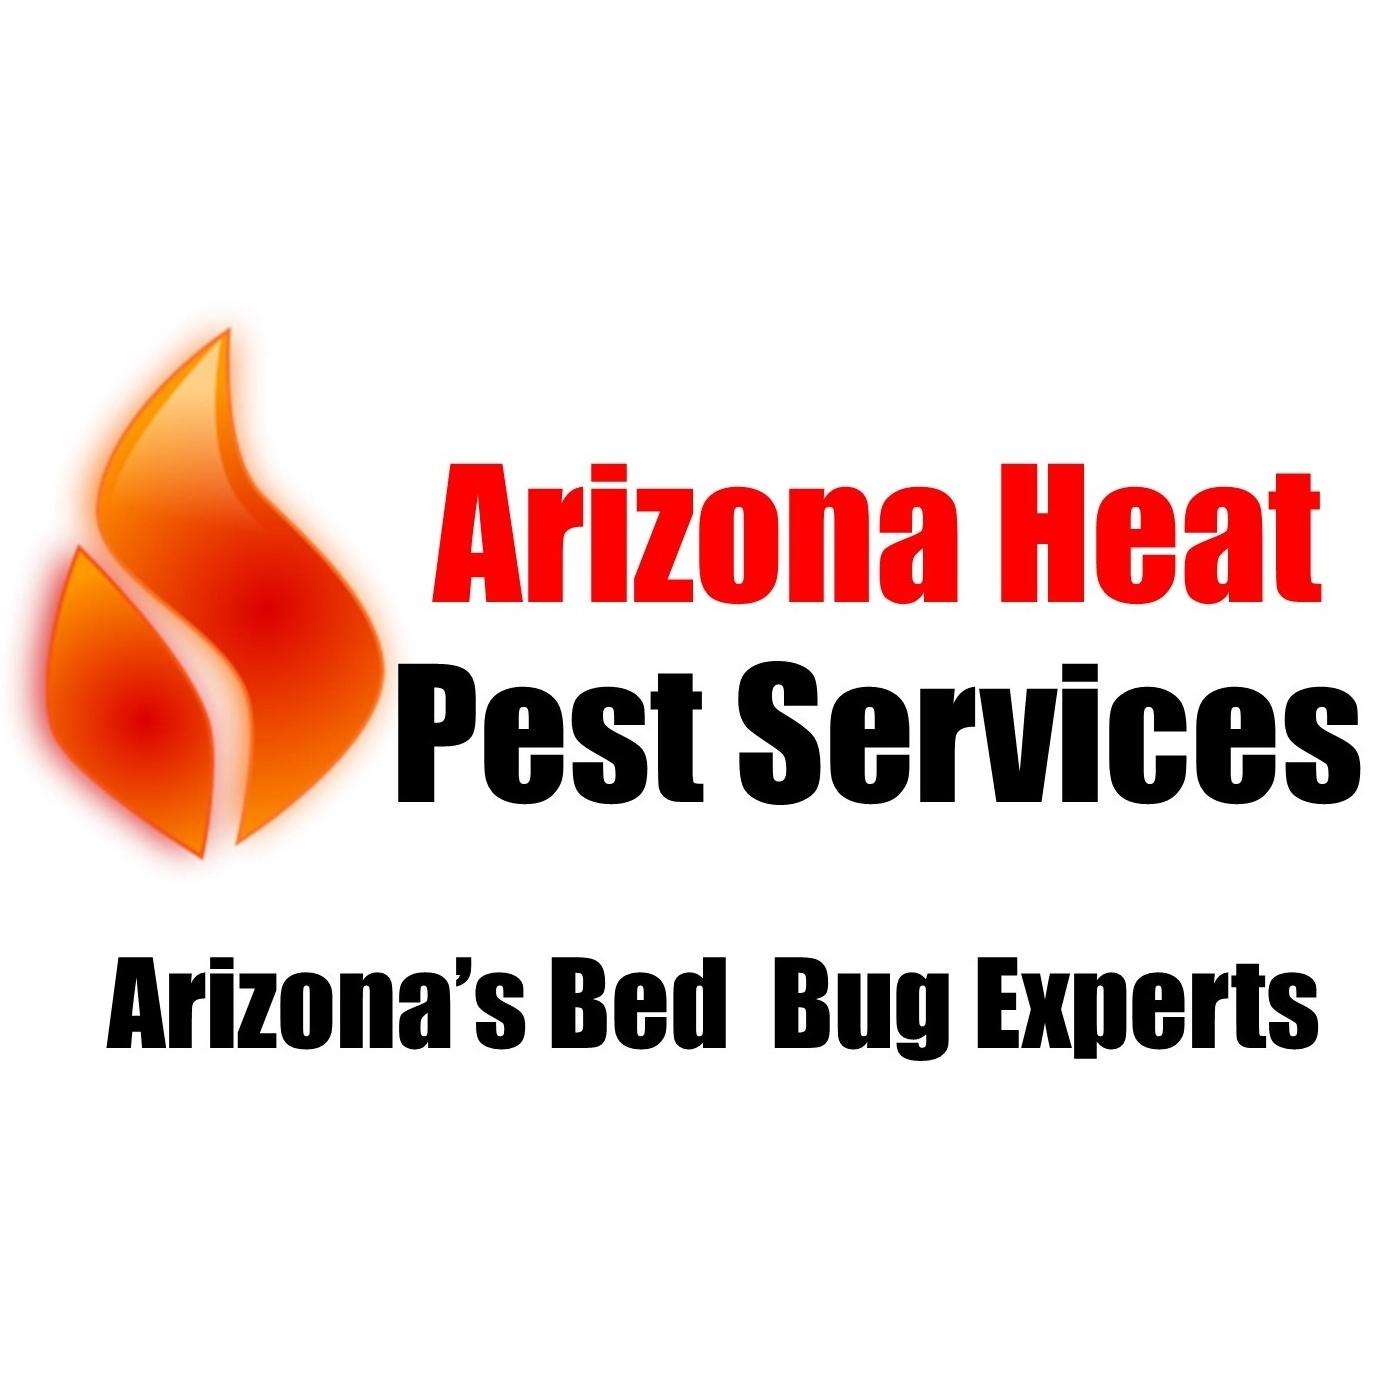 Arizona Heat Pest Services